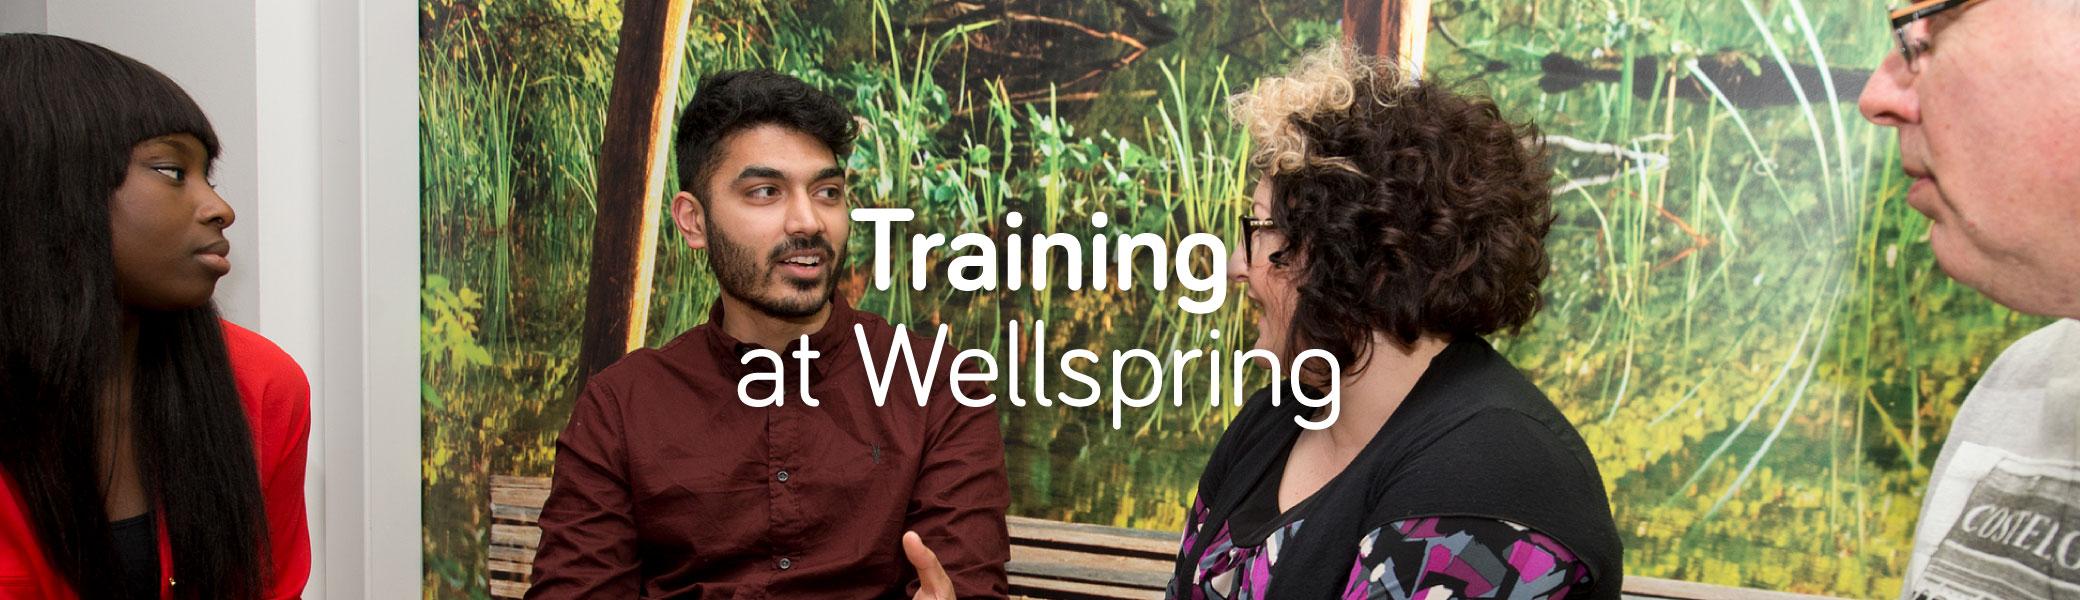 Wellspring-Training-Web_003